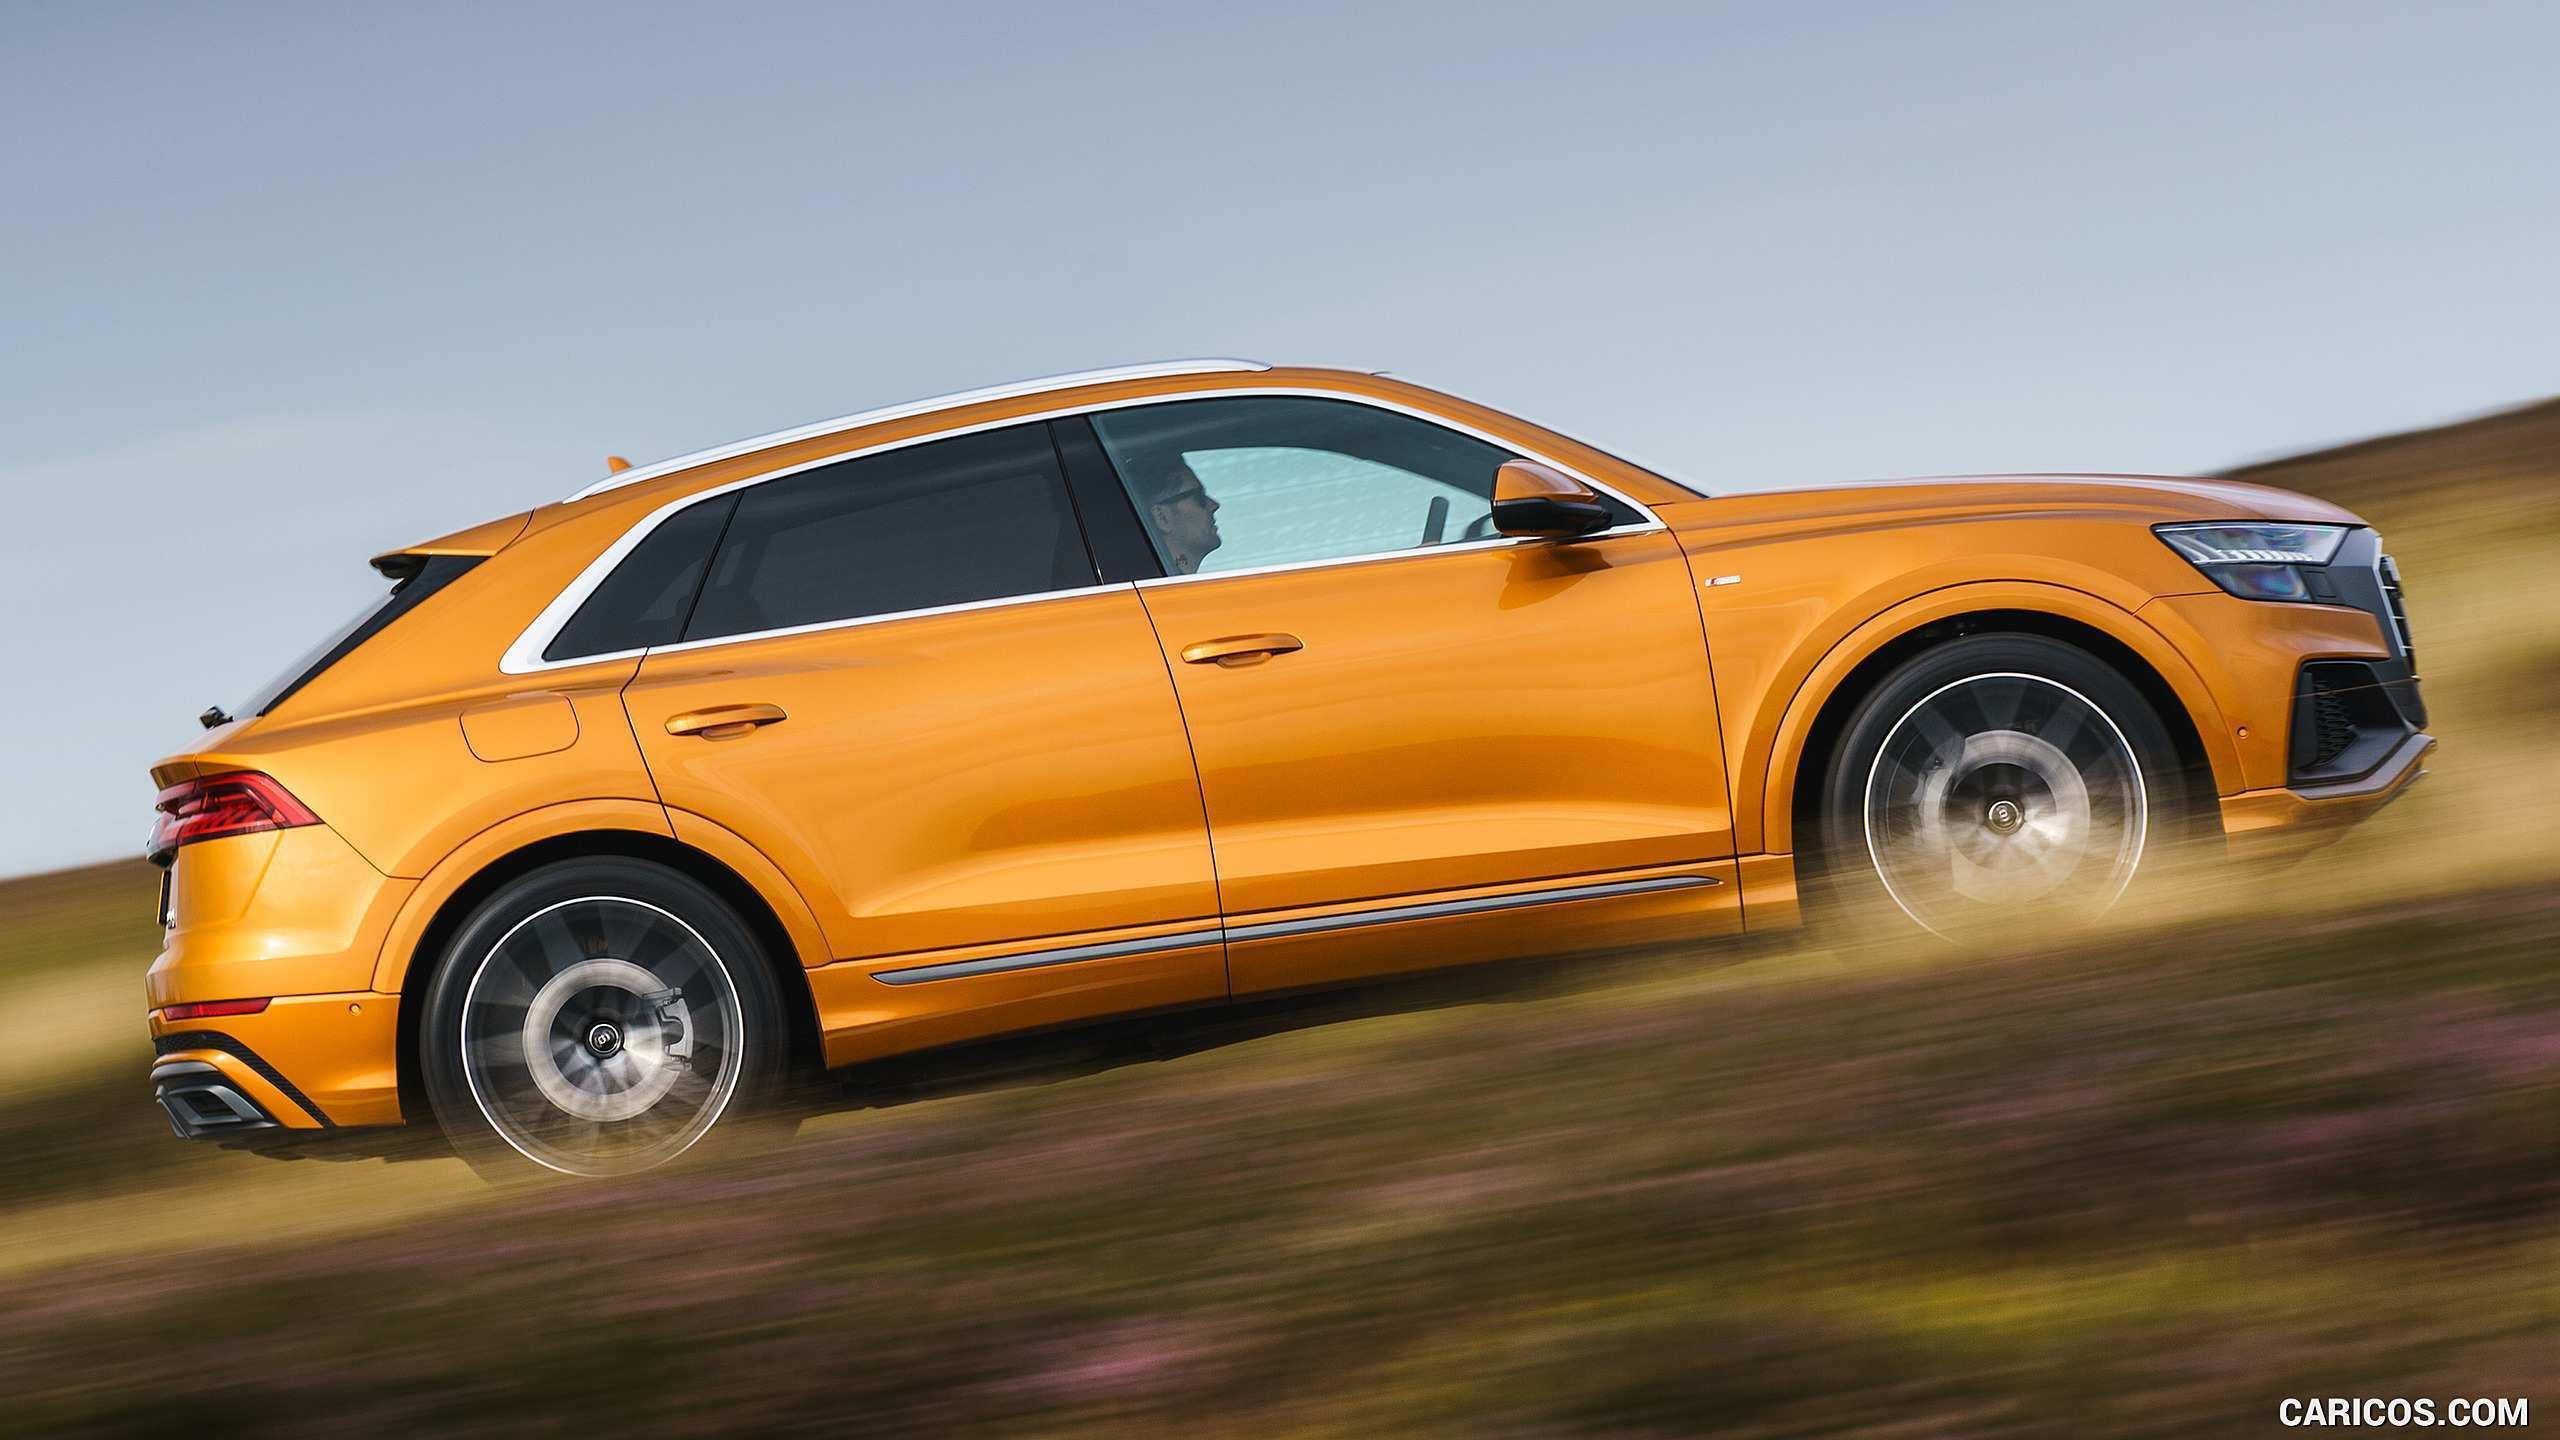 51 All New 2019 Audi Tdi Spy Shoot for 2019 Audi Tdi